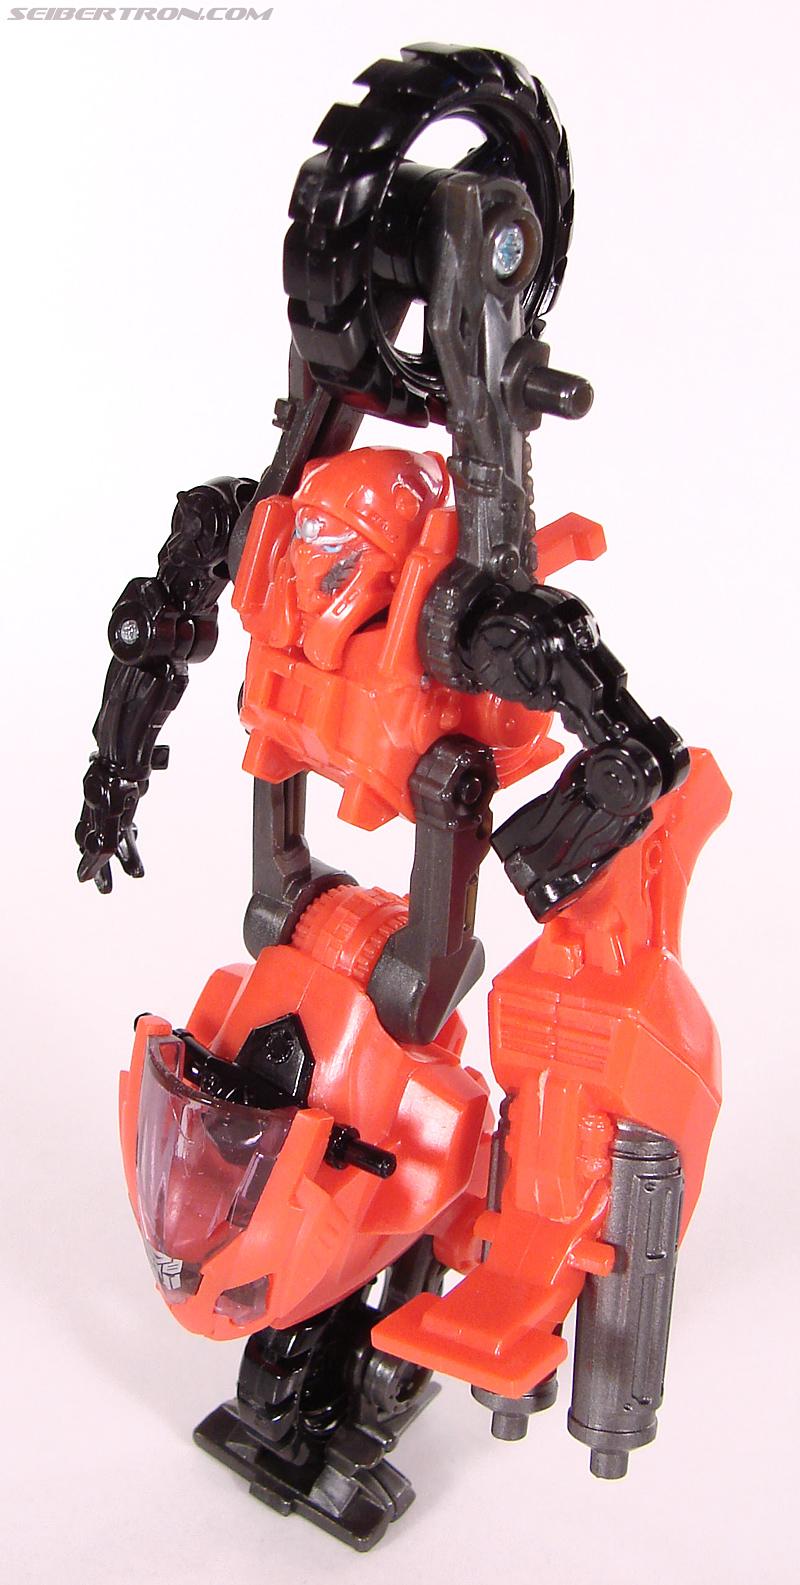 Transformers Revenge of the Fallen Arcee (Image #52 of 86)